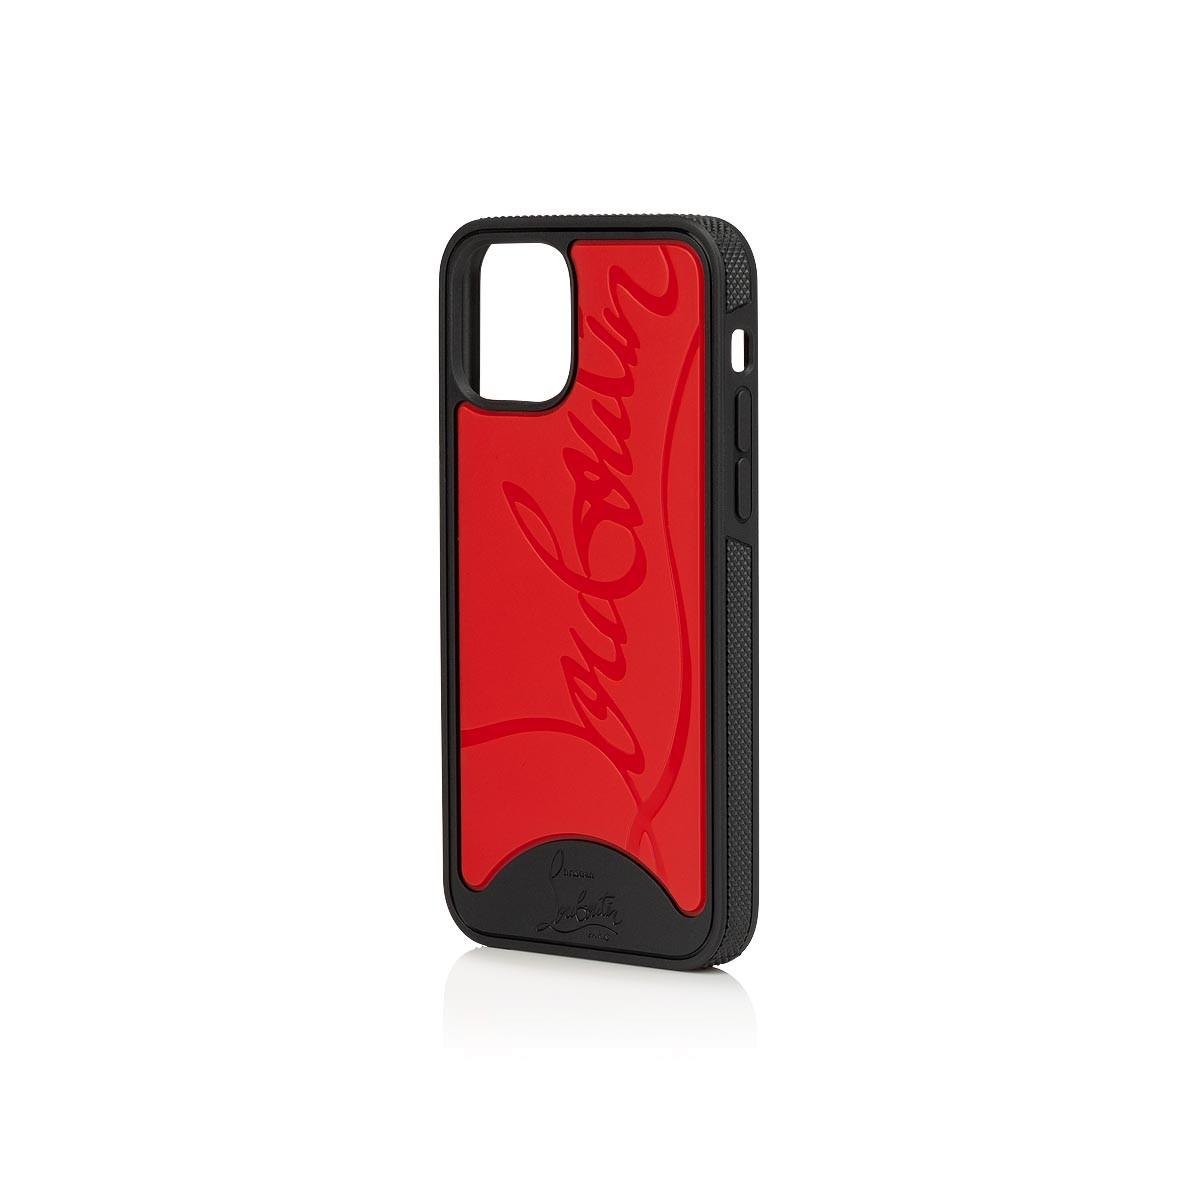 Petite Maroquinerie - Loubiphone Coque Iphone 11 Pro - Christian Louboutin